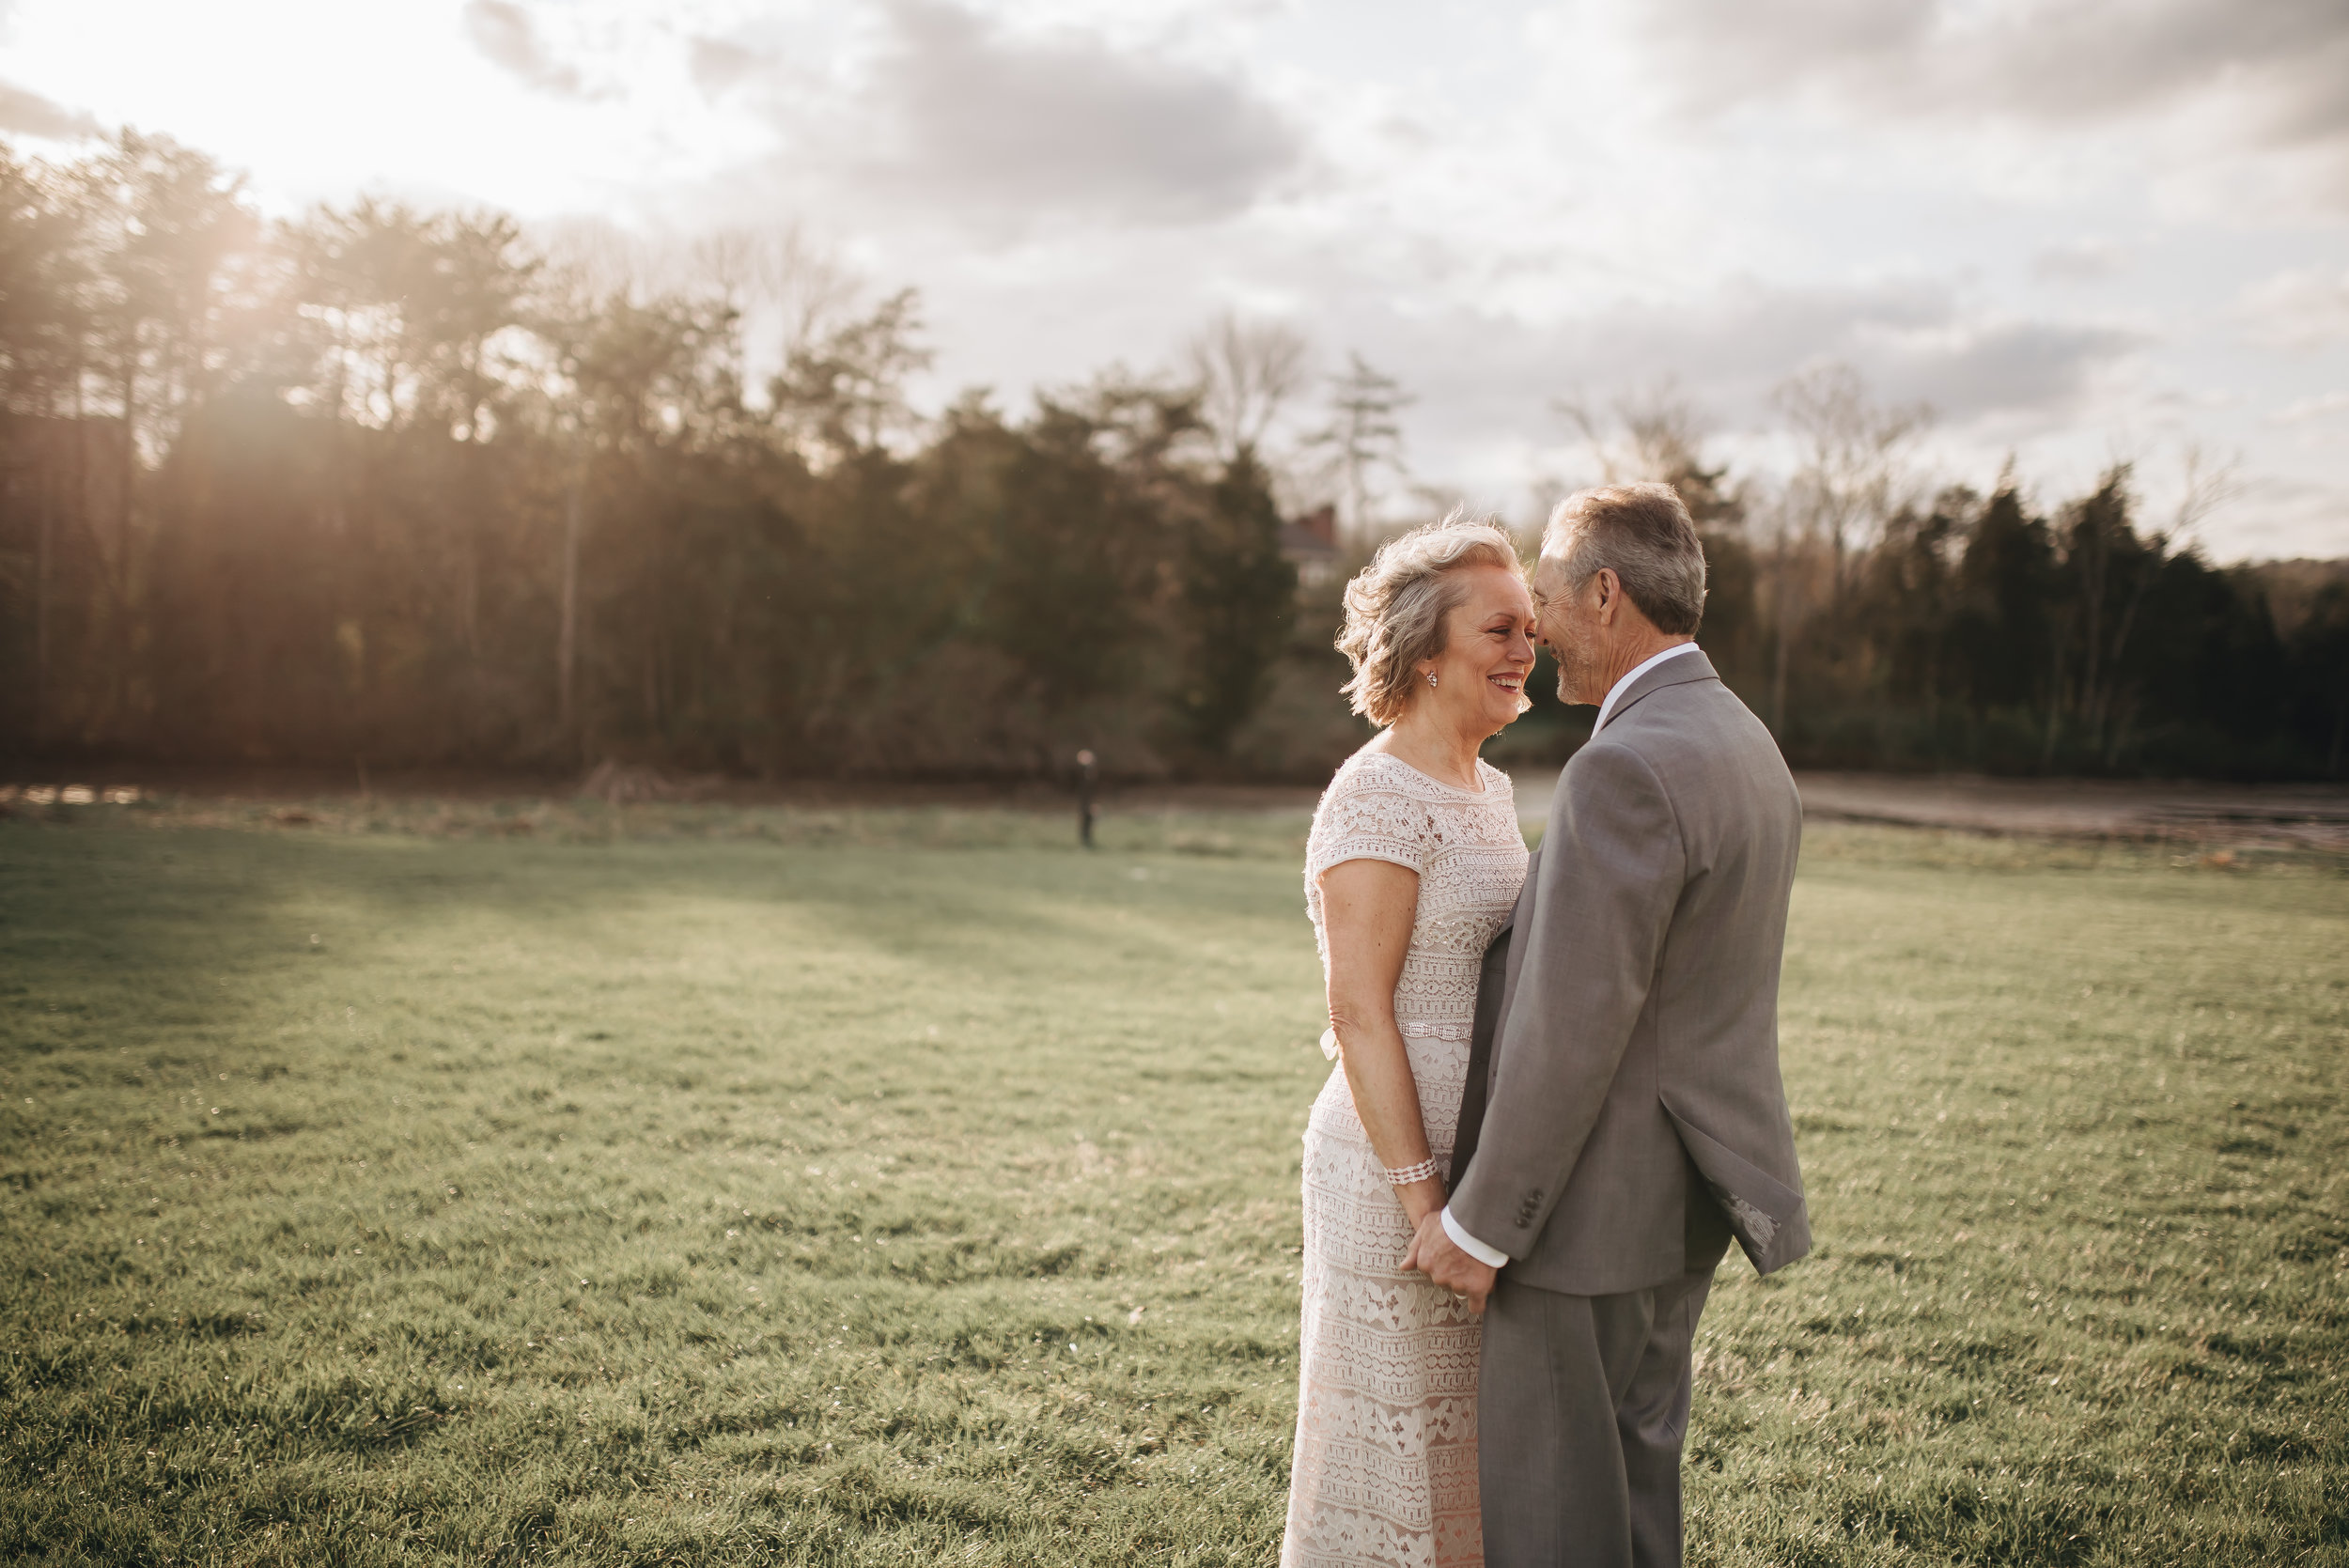 tina and bob wedding - edits-185.jpg